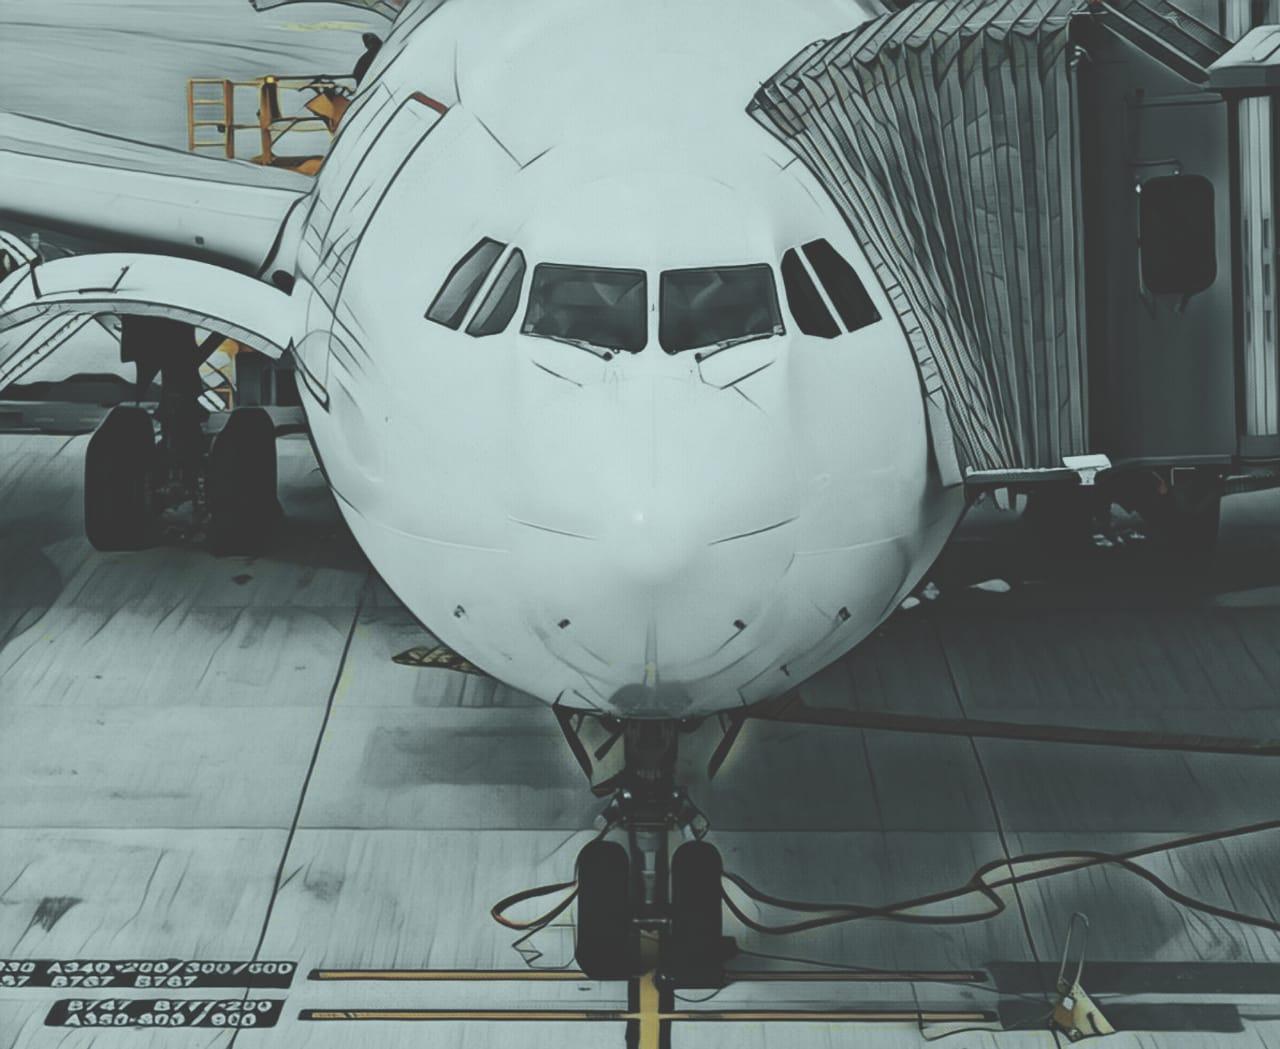 https: img-o.okeinfo.net content 2019 04 01 20 2037665 inflasi-maret-0-11-pemicunya-harga-tiket-pesawat-yang-mahal-C47lm1JE3T.jpeg